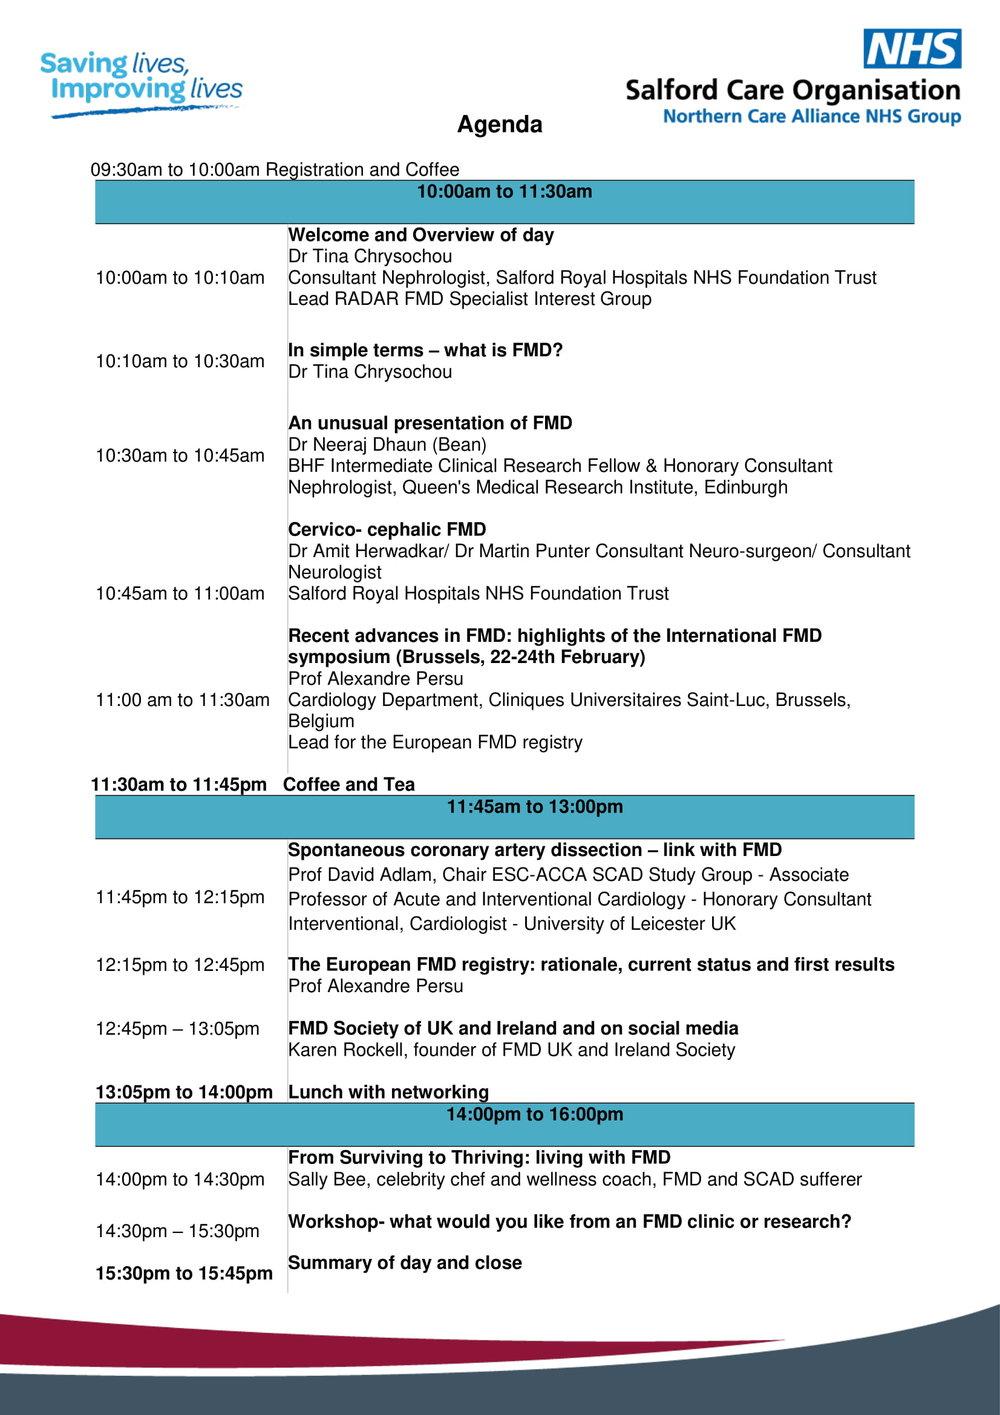 Agenda FMD Pt info day 2019 (1)-2.jpg